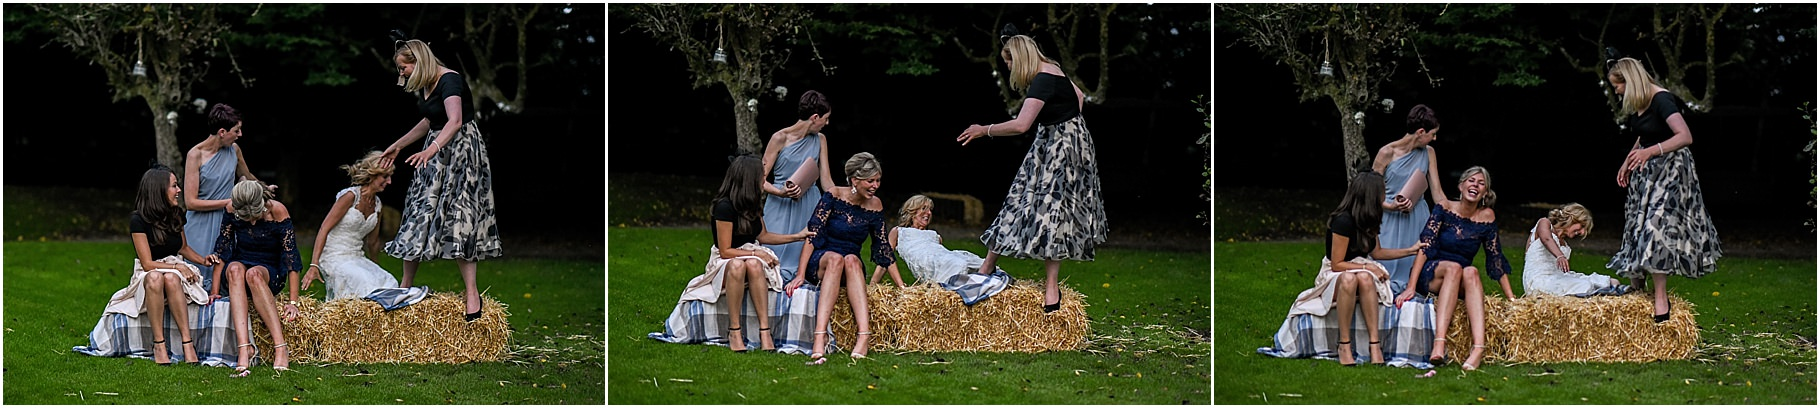 bartle-hall-wedding-photography-086.jpg